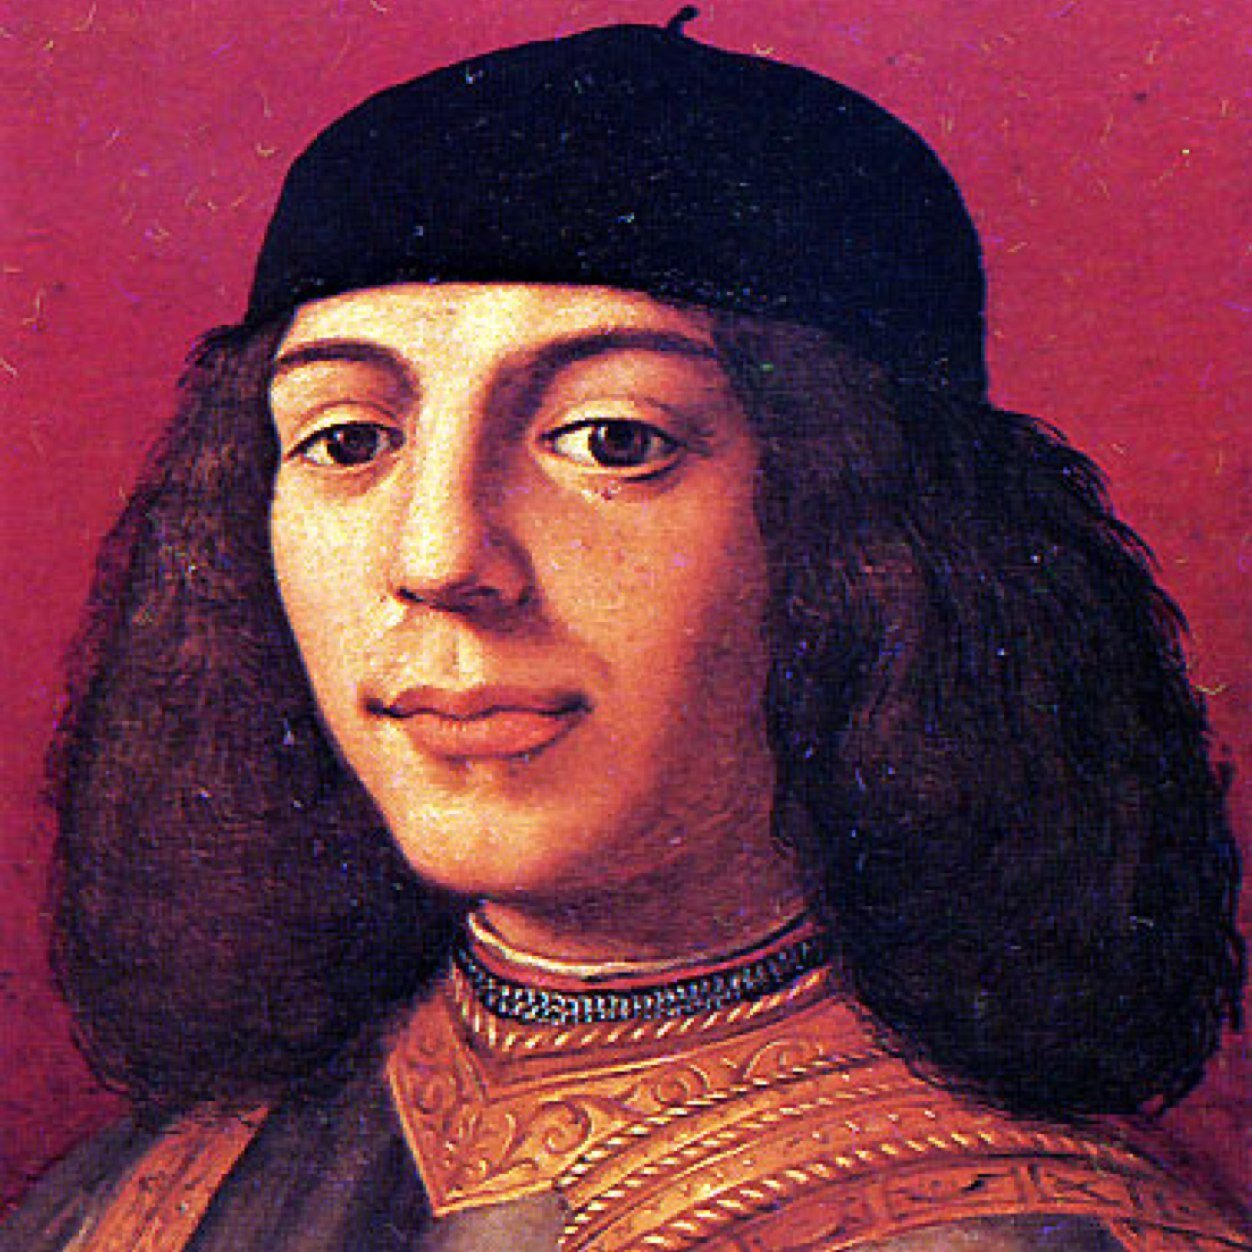 II. (Szerencsétlen) Piero de' Medici